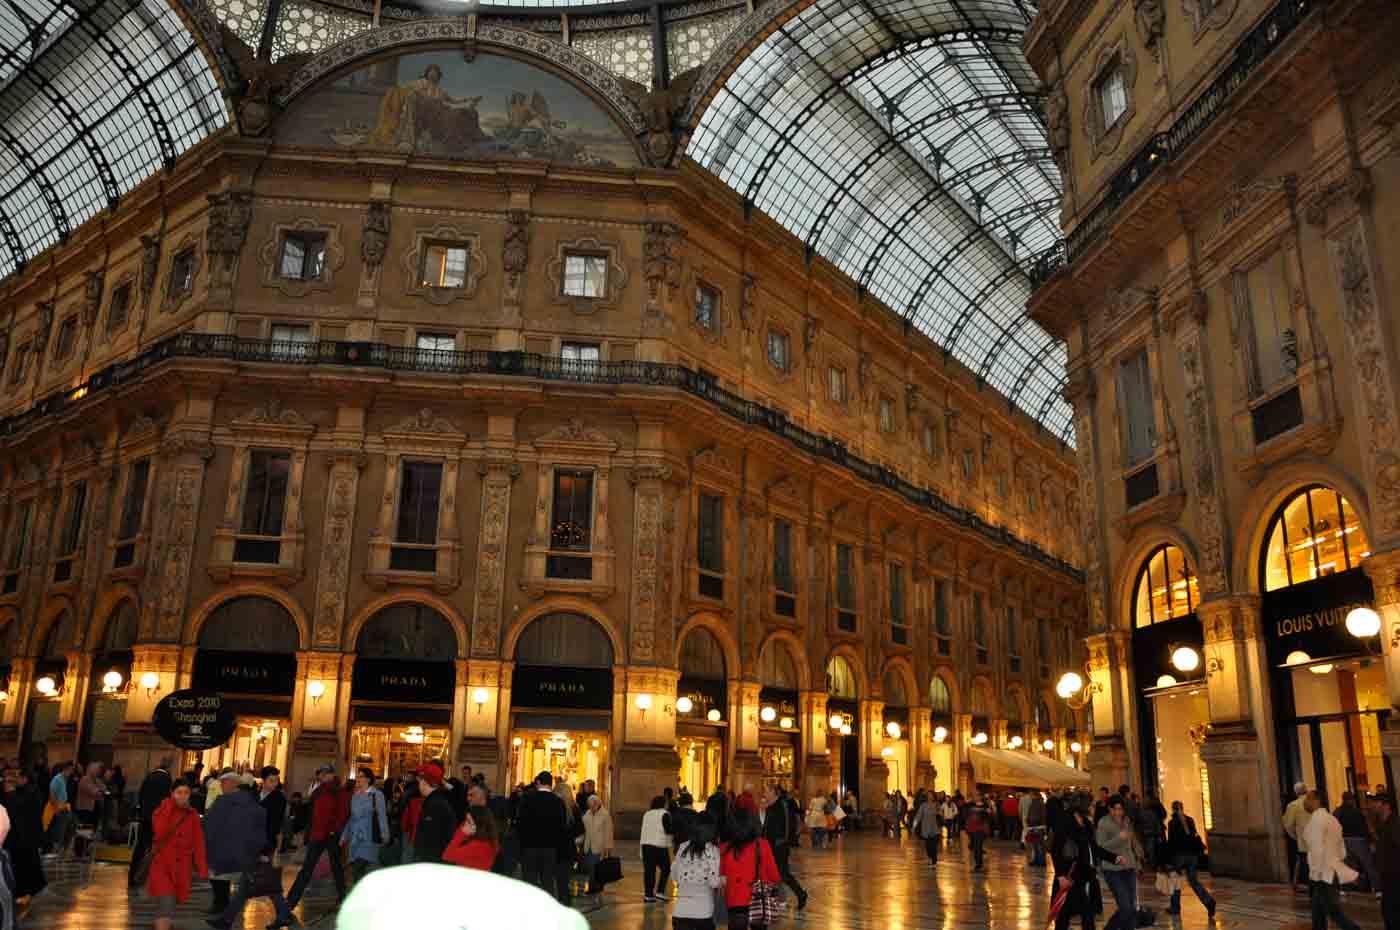 (Deutsch) Galleria Vittorio Emanuele II